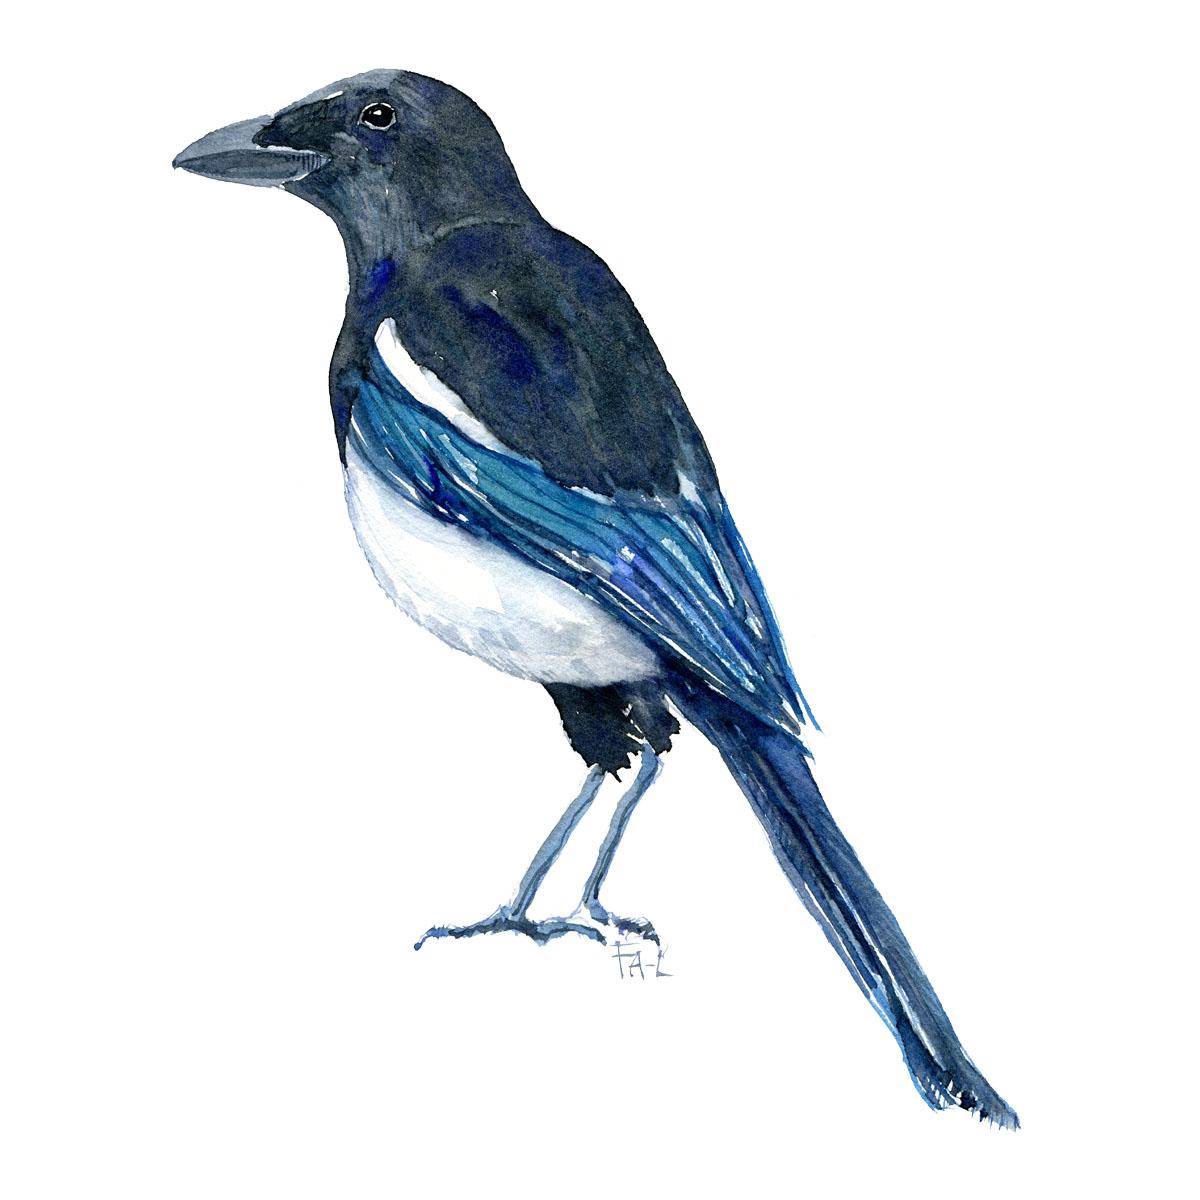 Husskade - Eurasian magpie bird watercolor painting. Artwork by Frits Ahlefeldt. Fugle akvarel